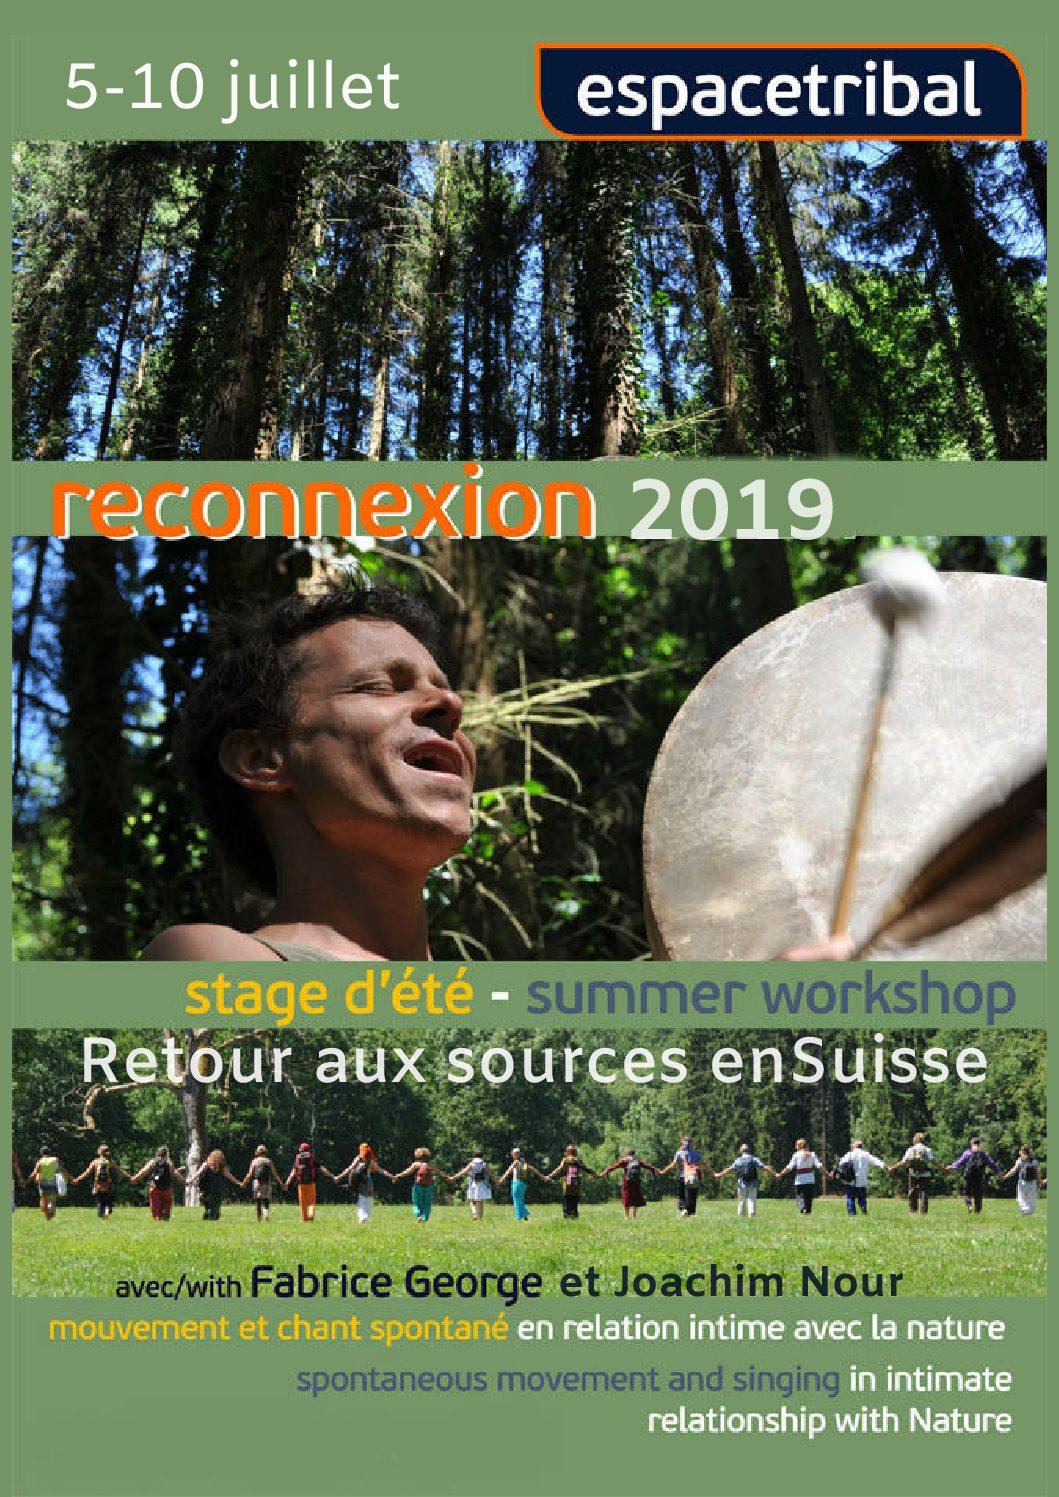 Reconnexion 2019 I Switzerland